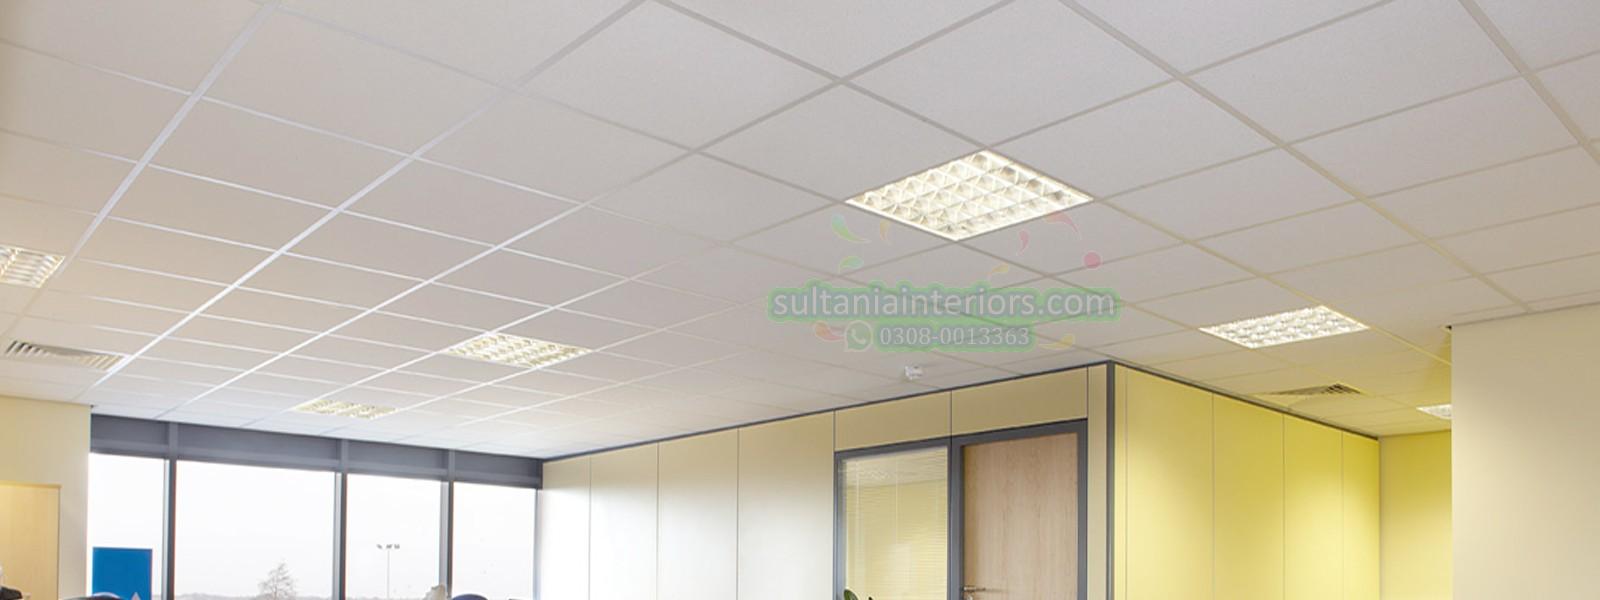 Pvc Gypsum Ceiling 2x2 Gypsum Tiles False Ceiling